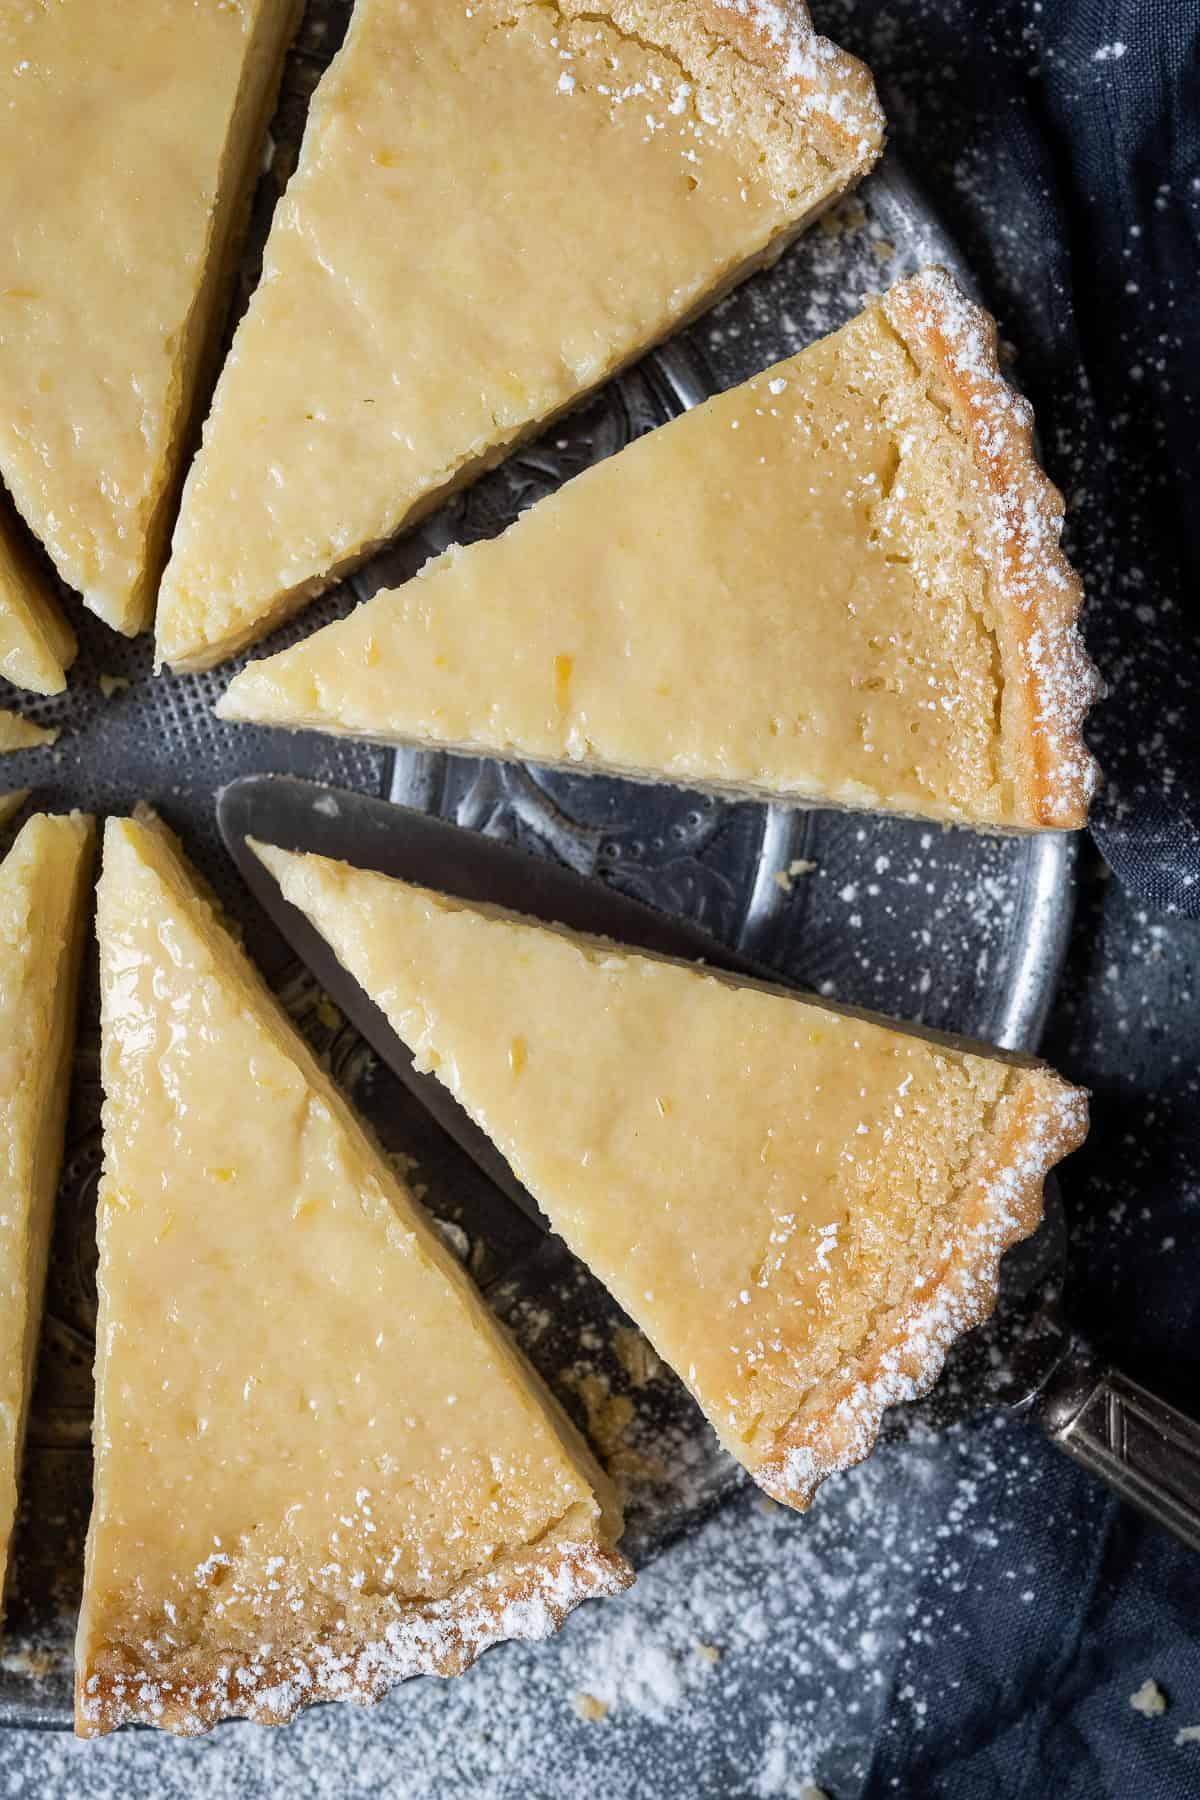 Slices of vegan lemon tart on a metal plate.